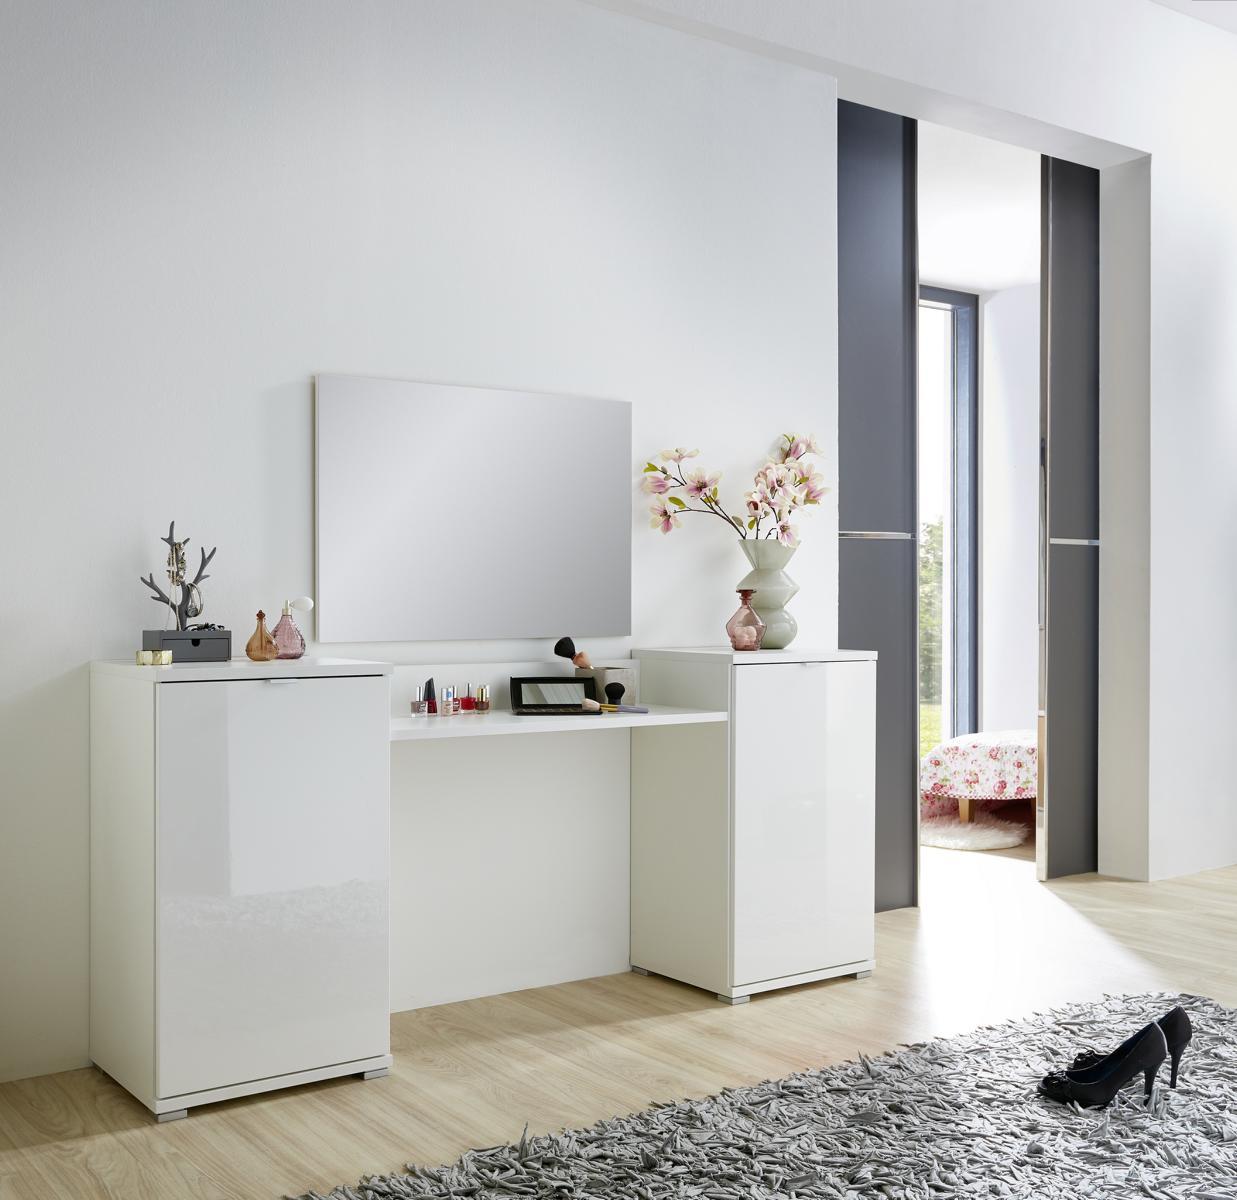 4 tlg schminkplatz schminktisch kosmetiktisch set mod gm852 weiss hochglanz ebay. Black Bedroom Furniture Sets. Home Design Ideas